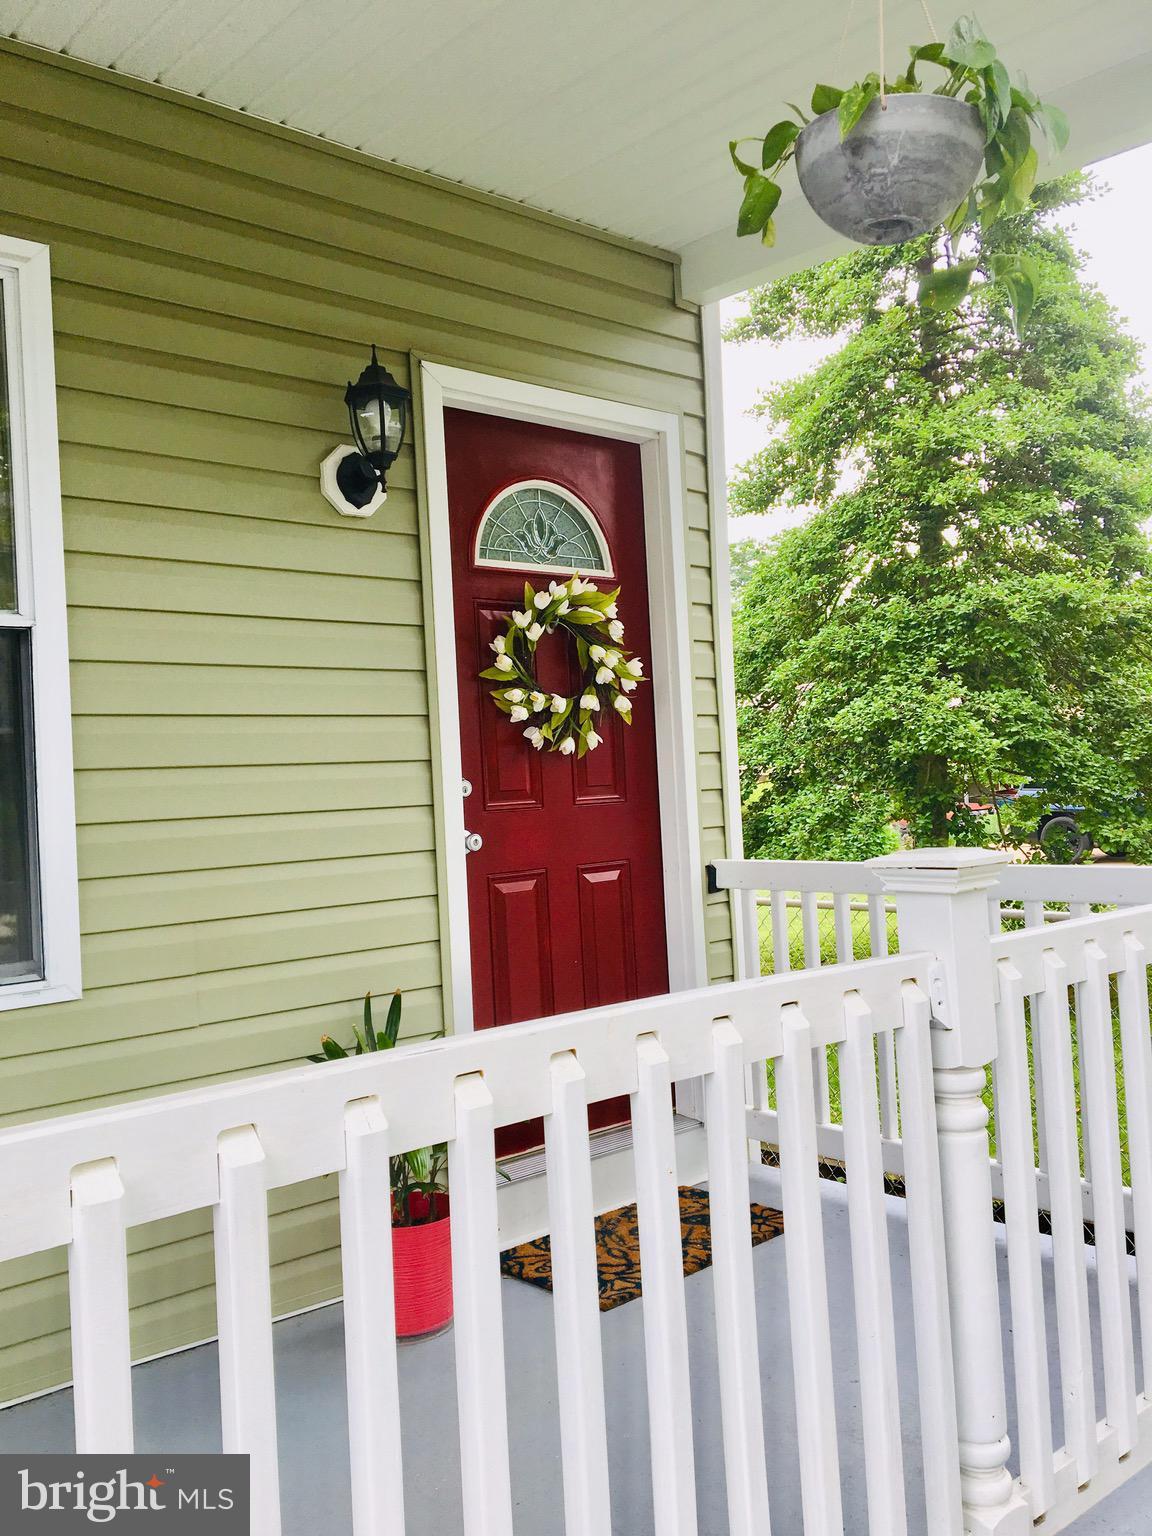 617 W 2 Nd Street, Florence, NJ 08518, MLS # NJBL344644 | Crossroads  For Adults Tree House Plans on